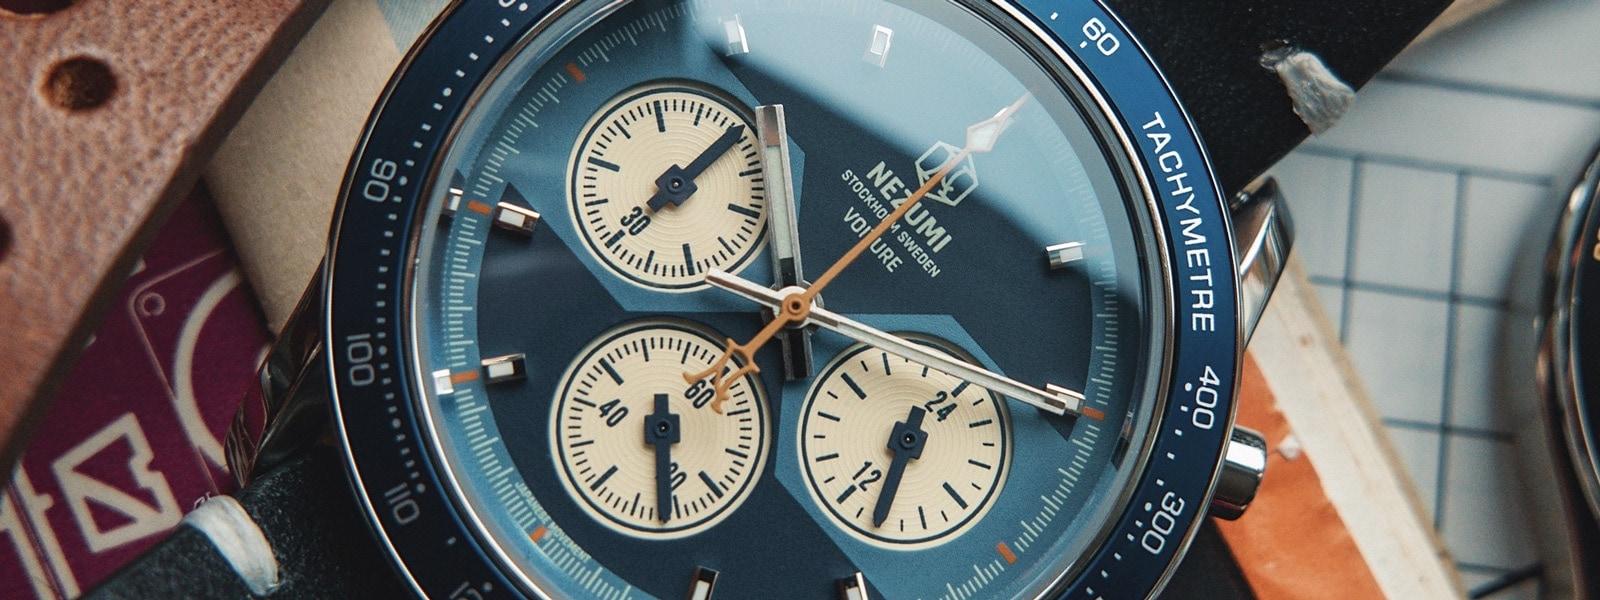 Voiture racing chronograph ref. VQ2. 601 watch by Nezumi Studios